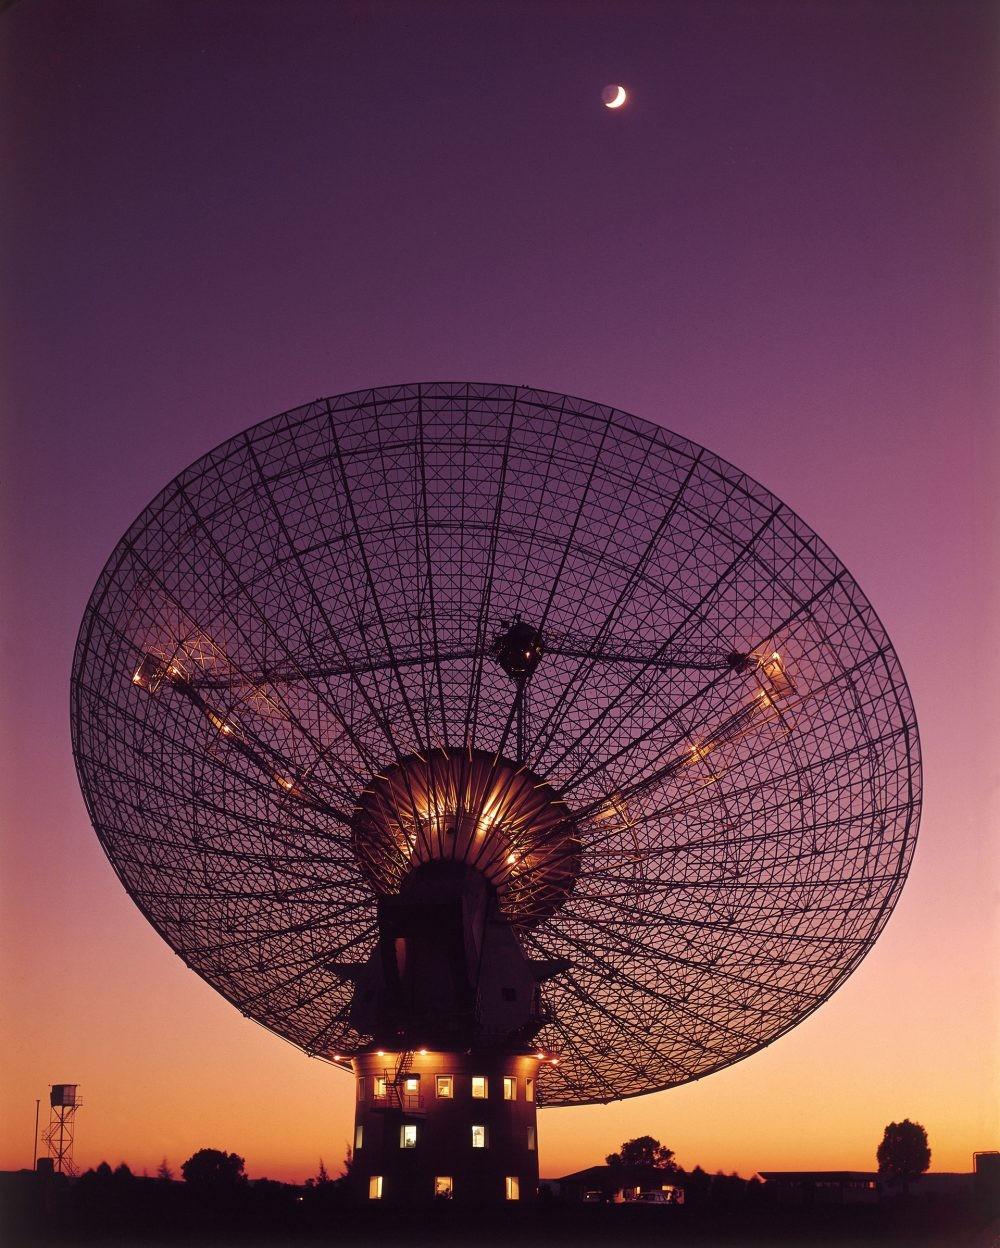 Parkes-CSIRO